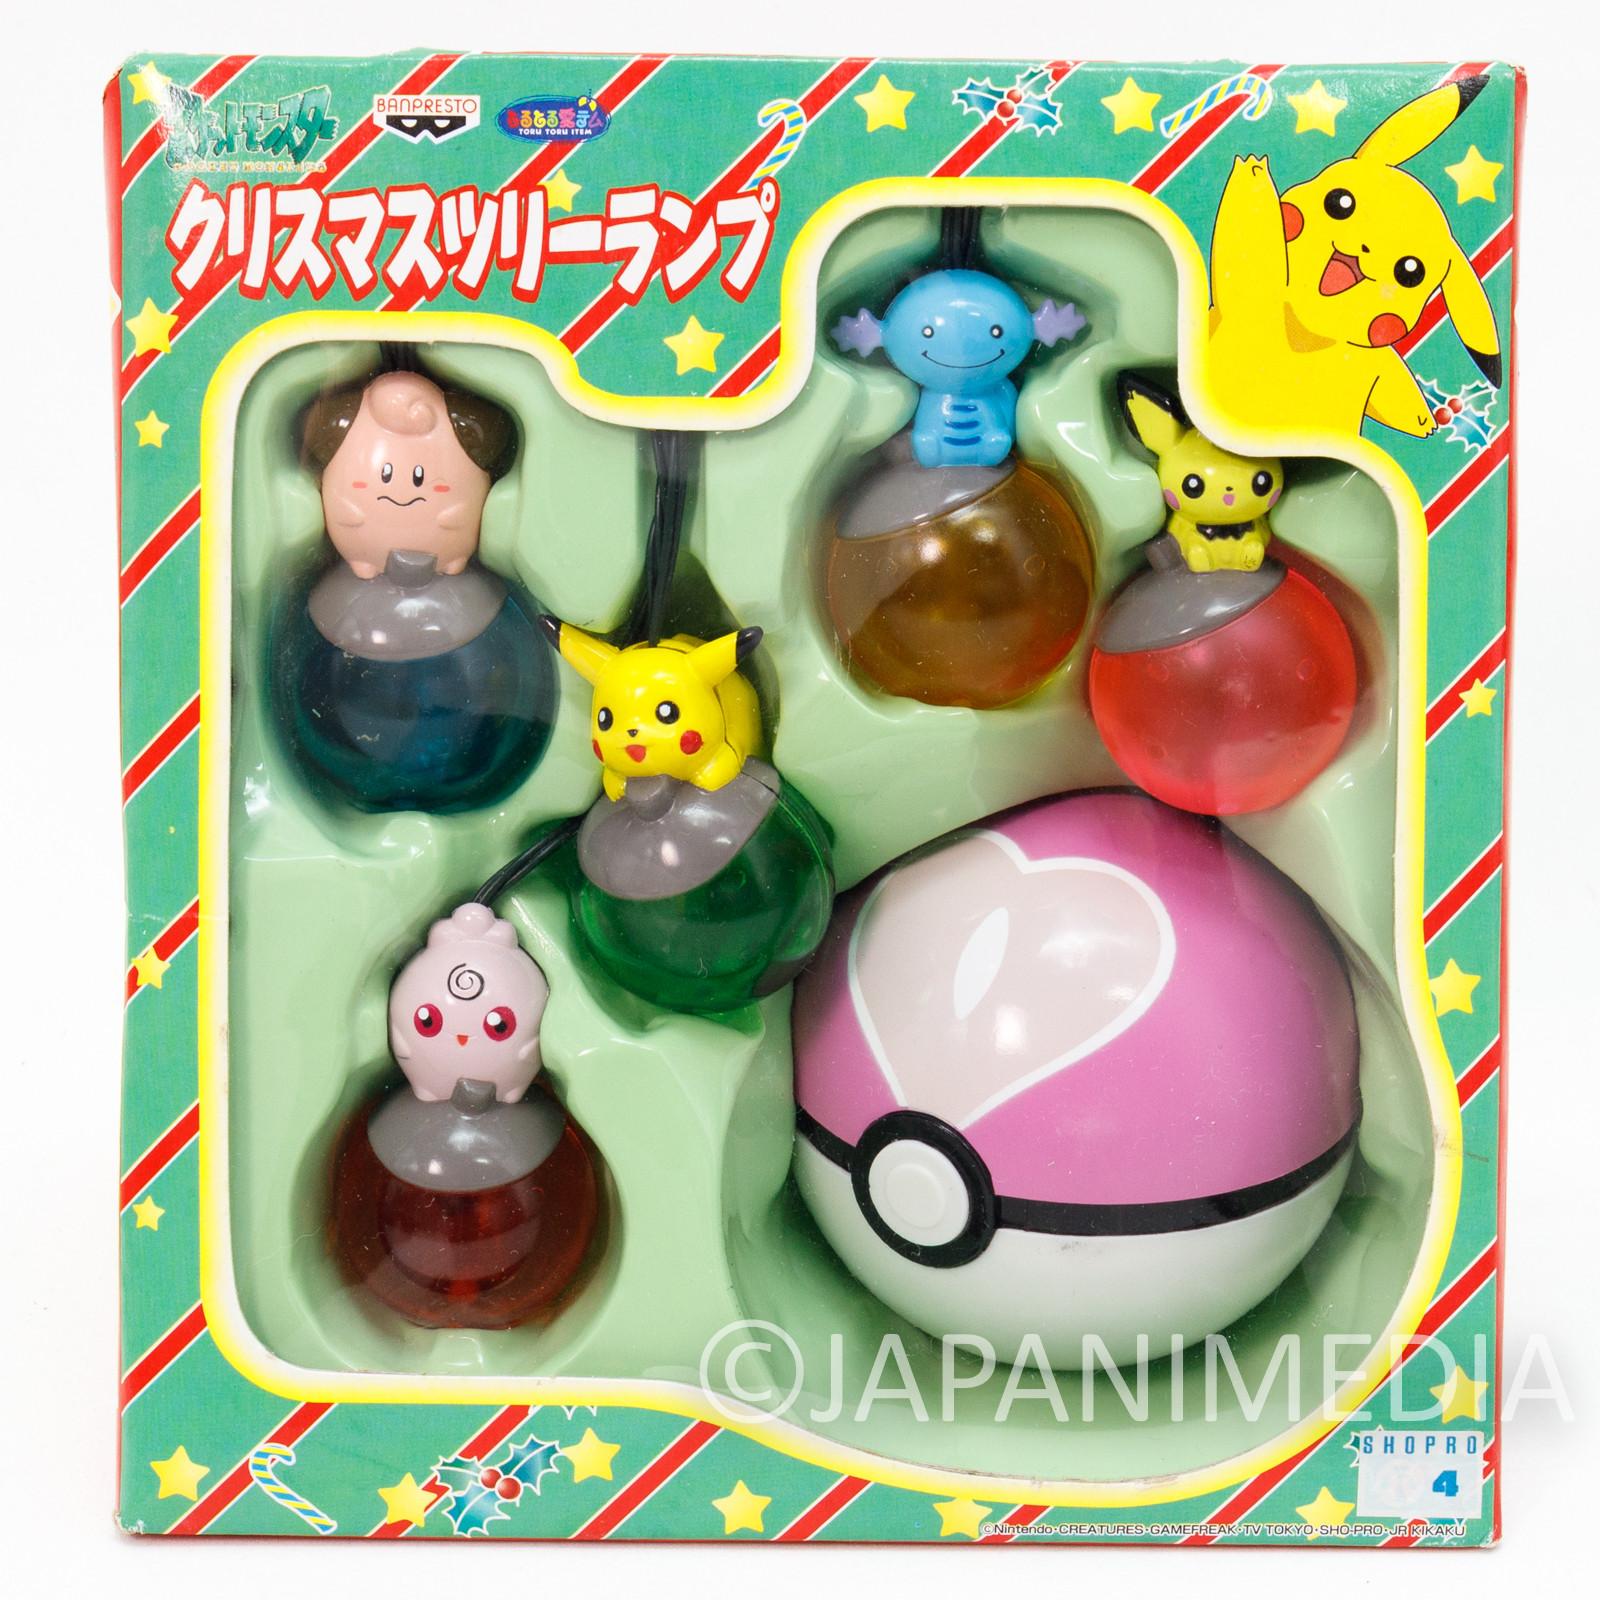 Pokemon Christmas Tree Lamp Light Ornament #3 Banpresto JAPAN ANIME PIKACHU